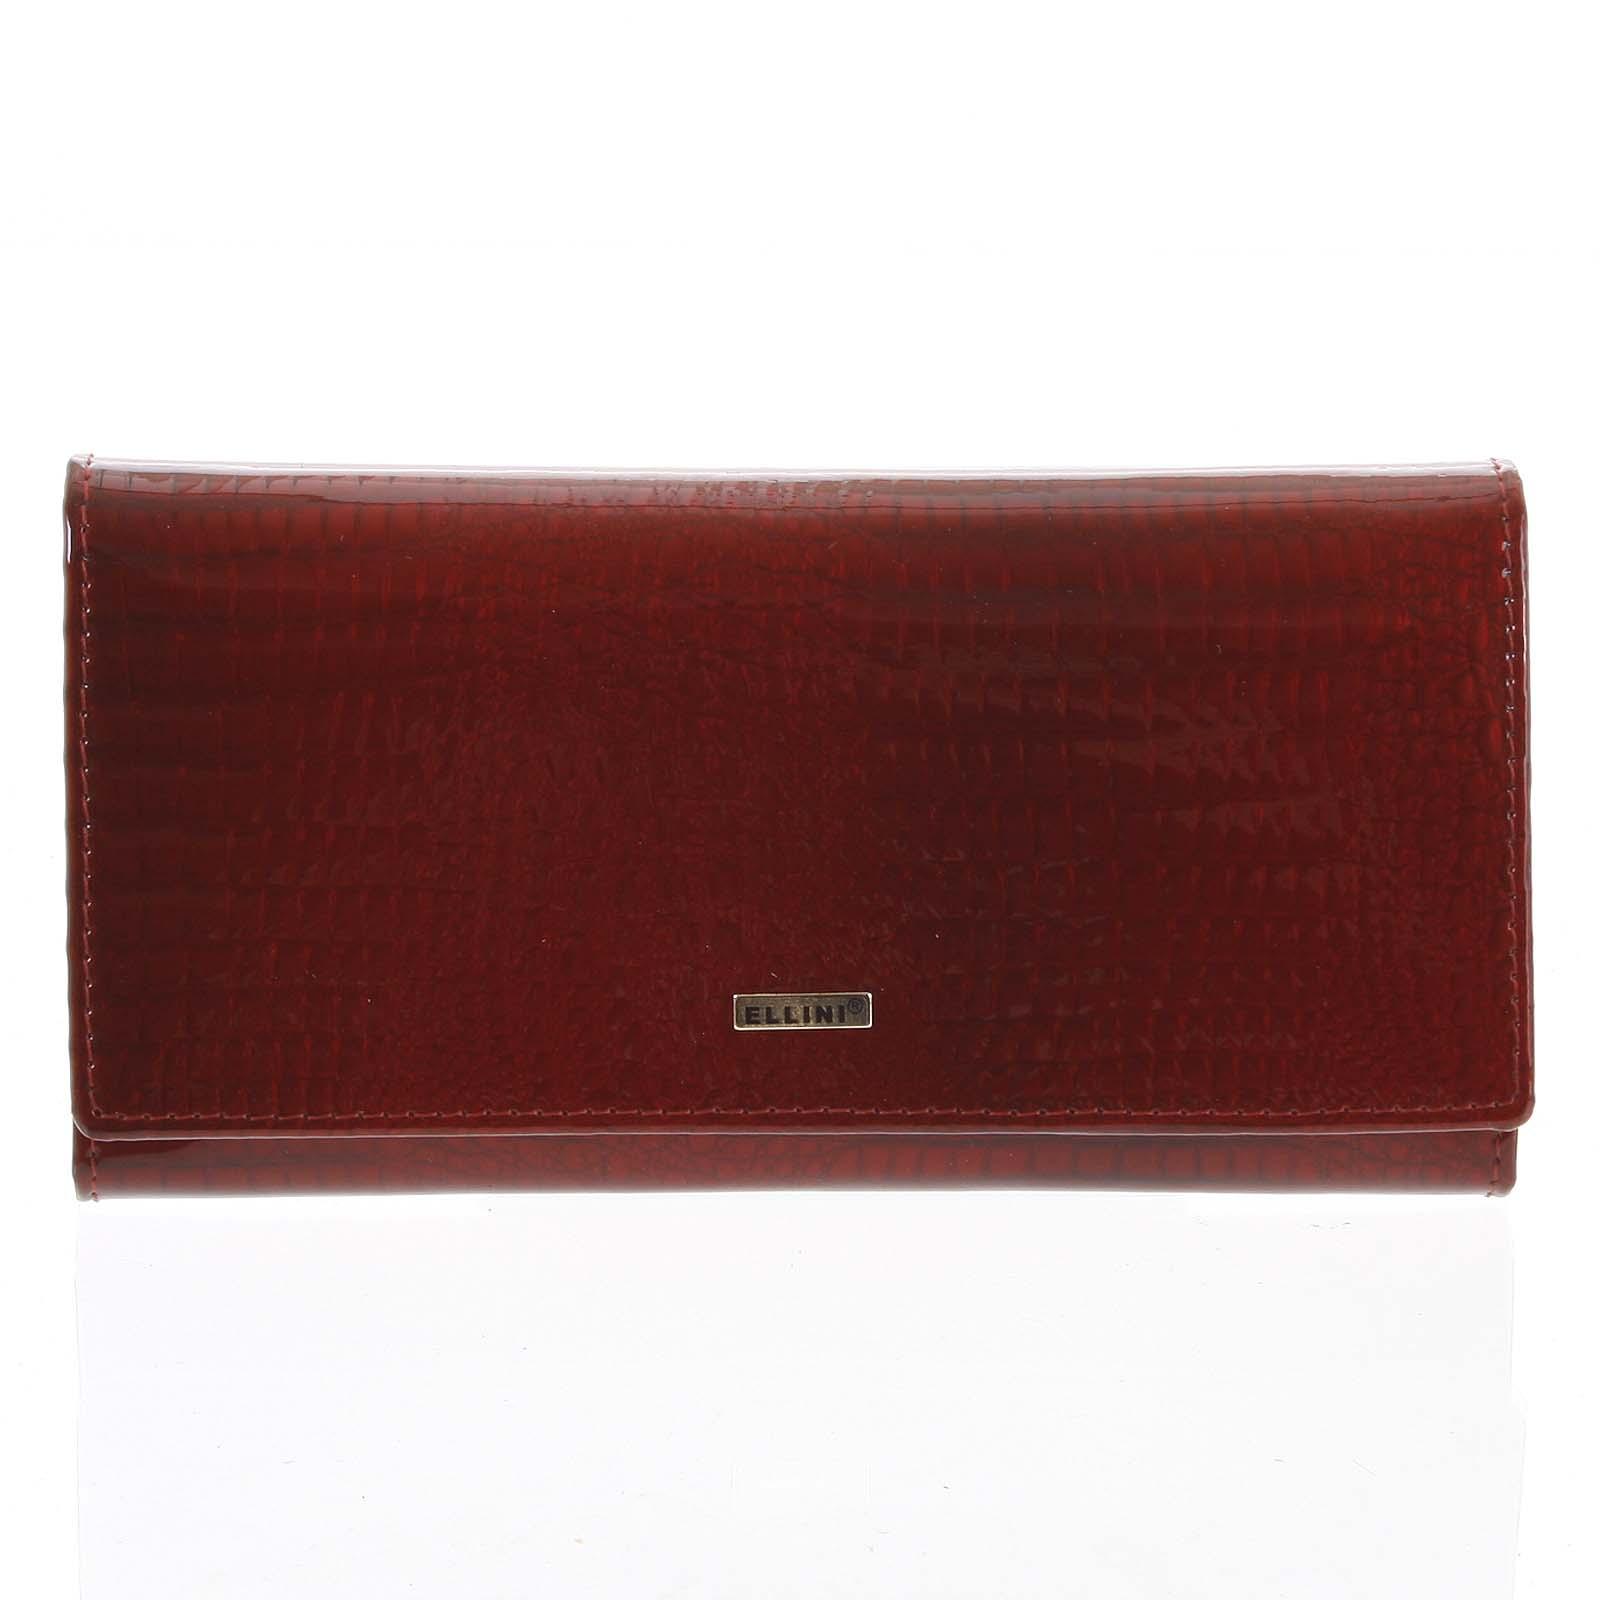 Dámská kožená peněženka červená - Ellini Curcio